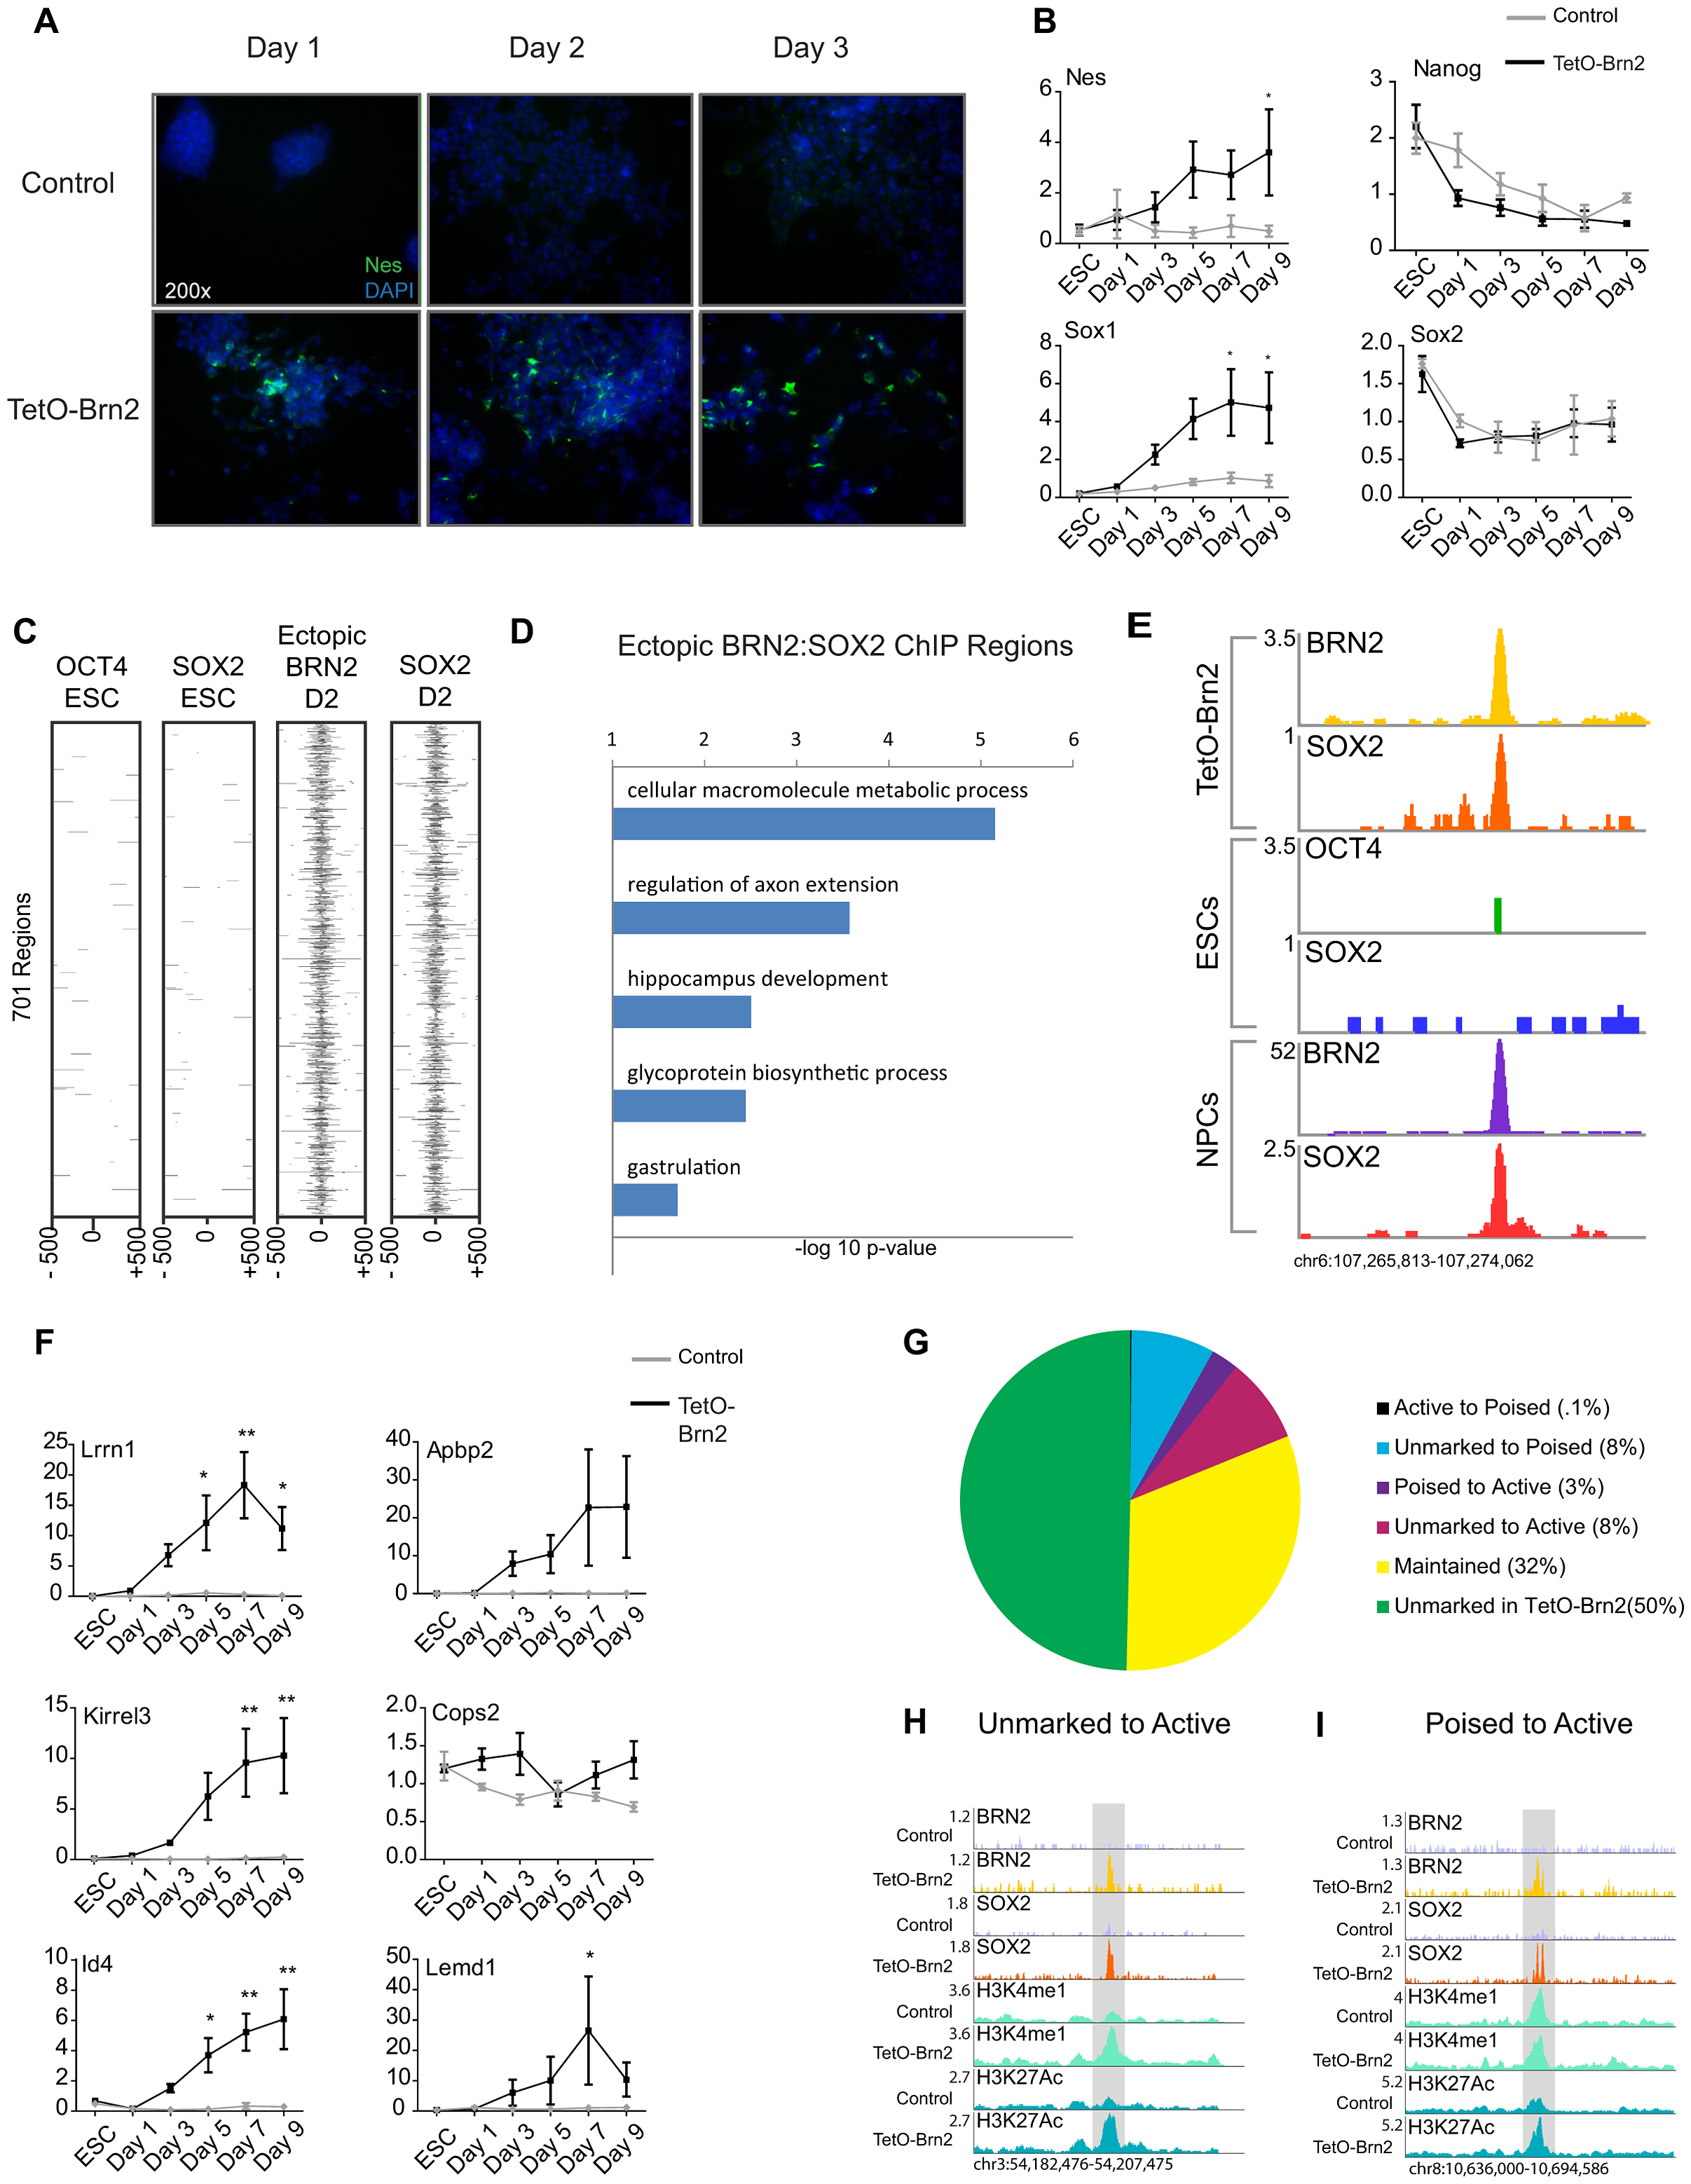 Brn2 biases ES cells towards neural differentiation.